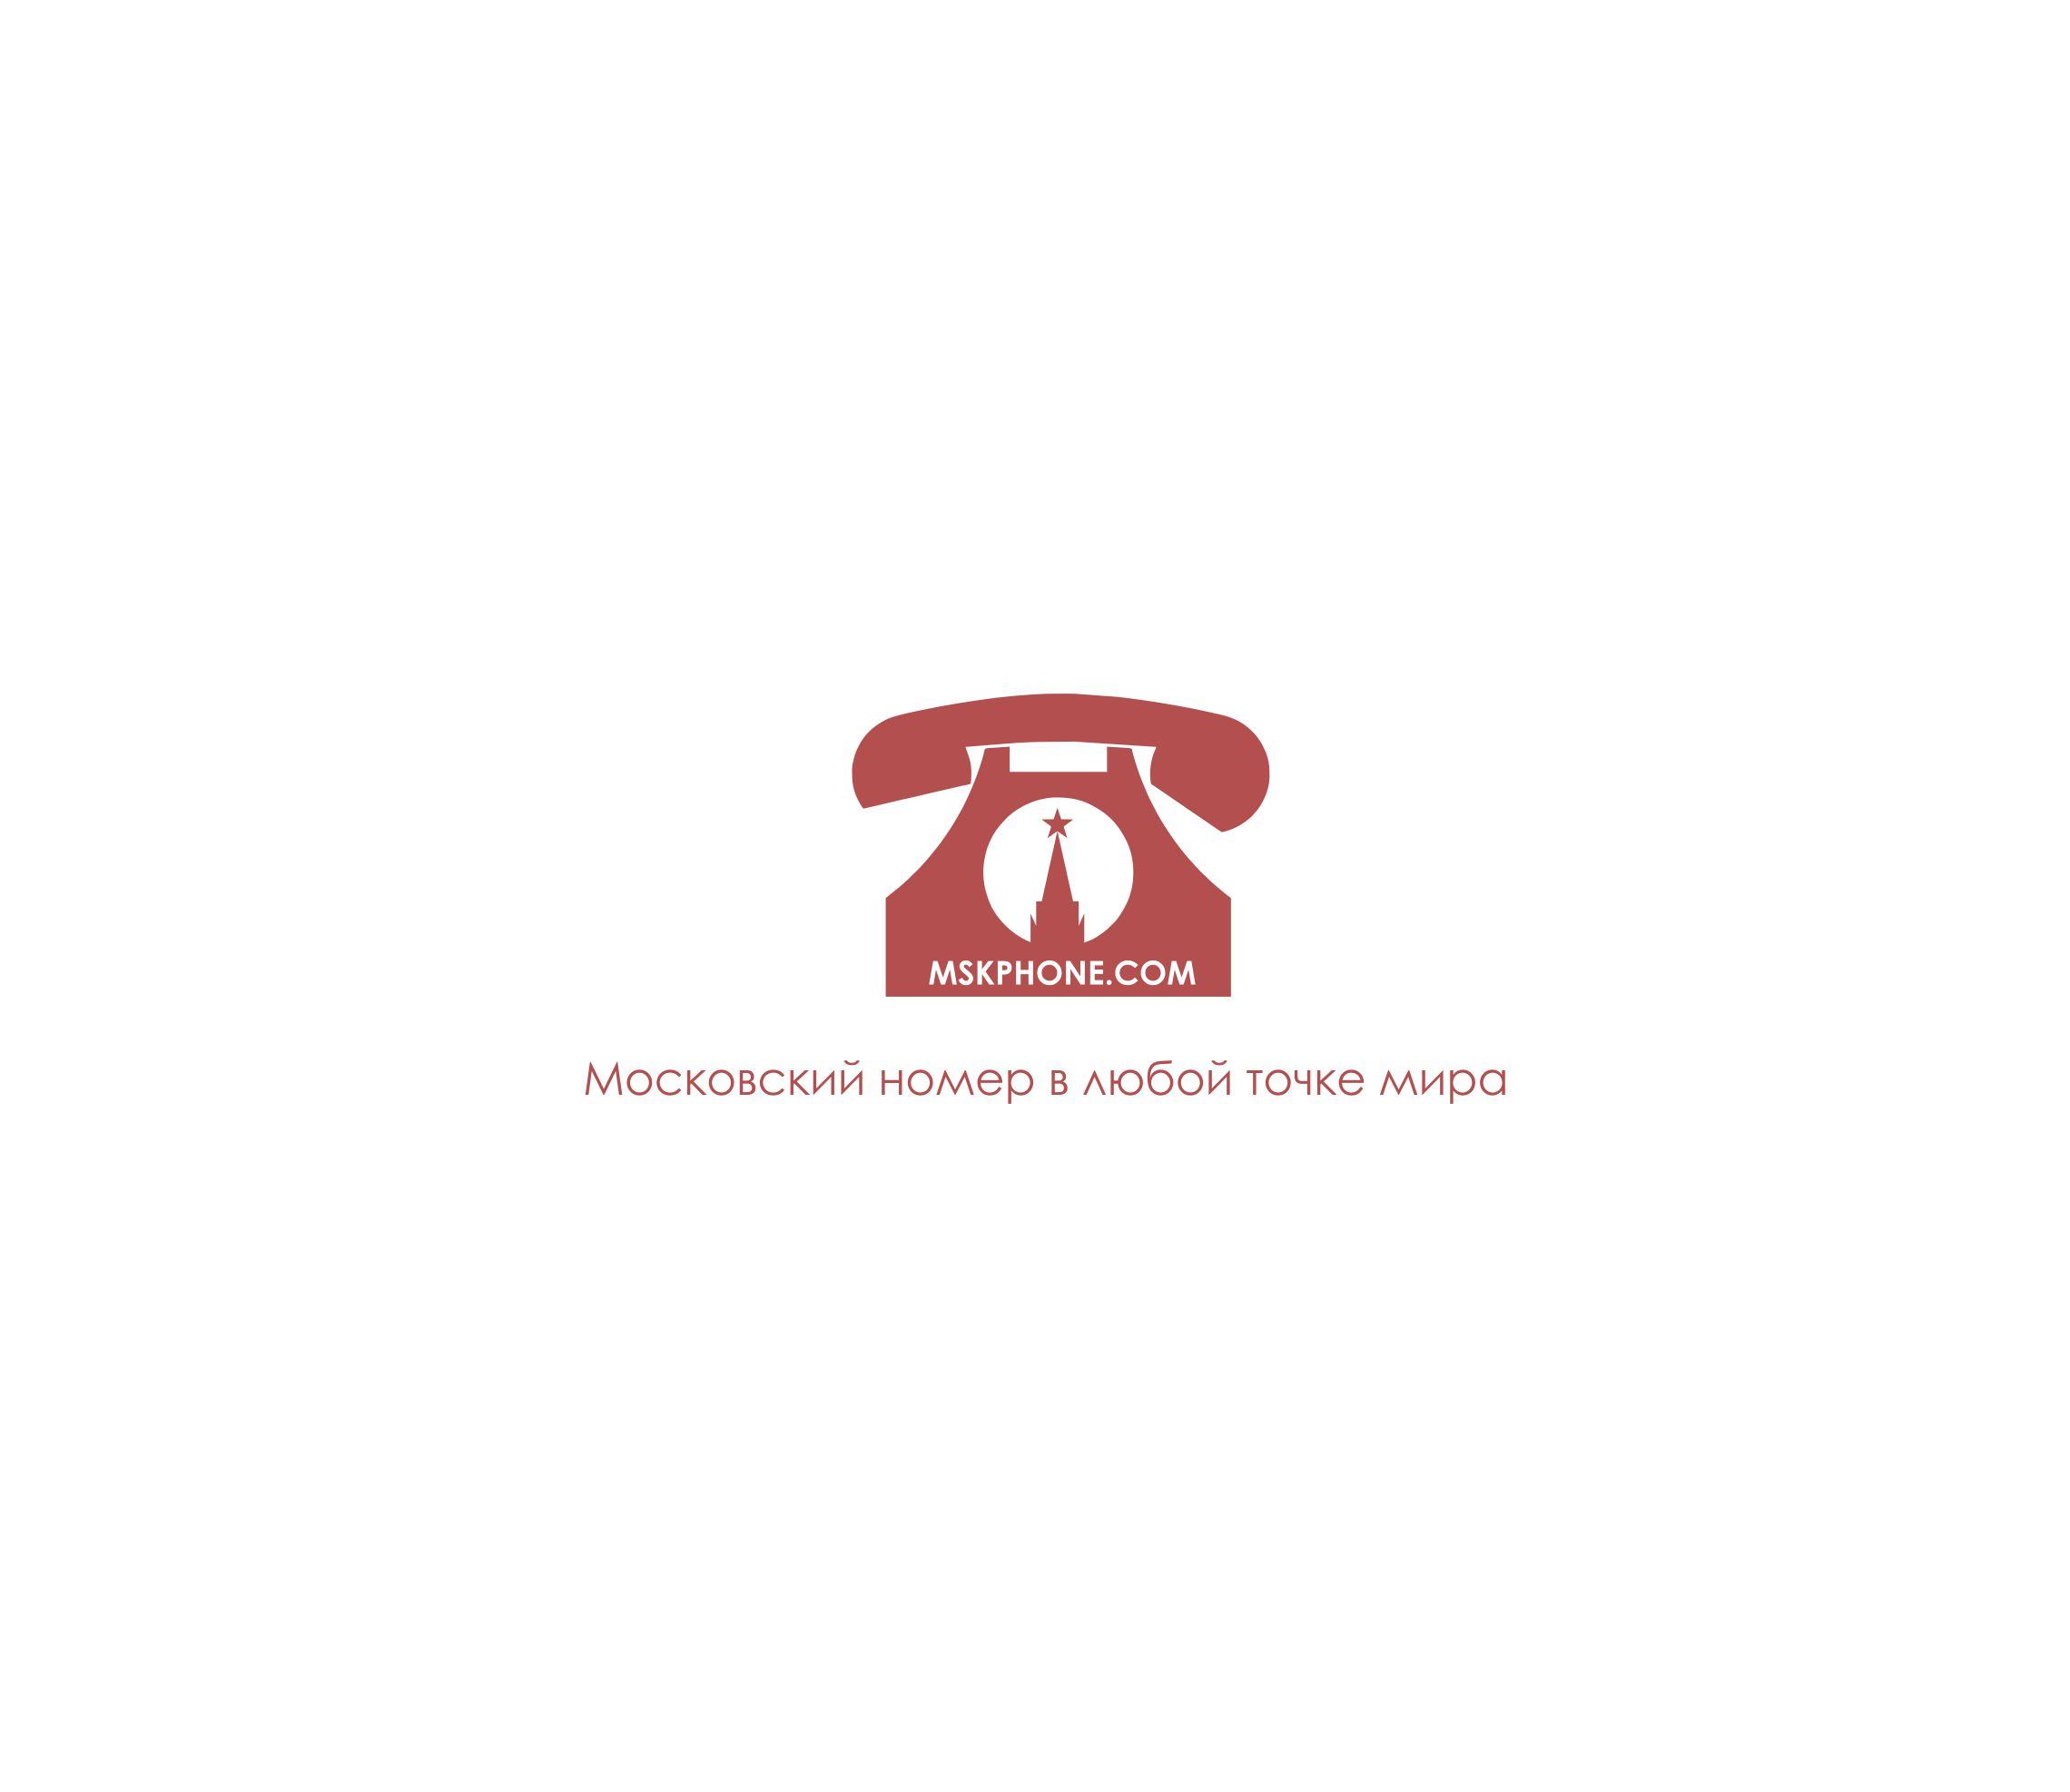 Логотип для MSKPHONE - дизайнер give_5